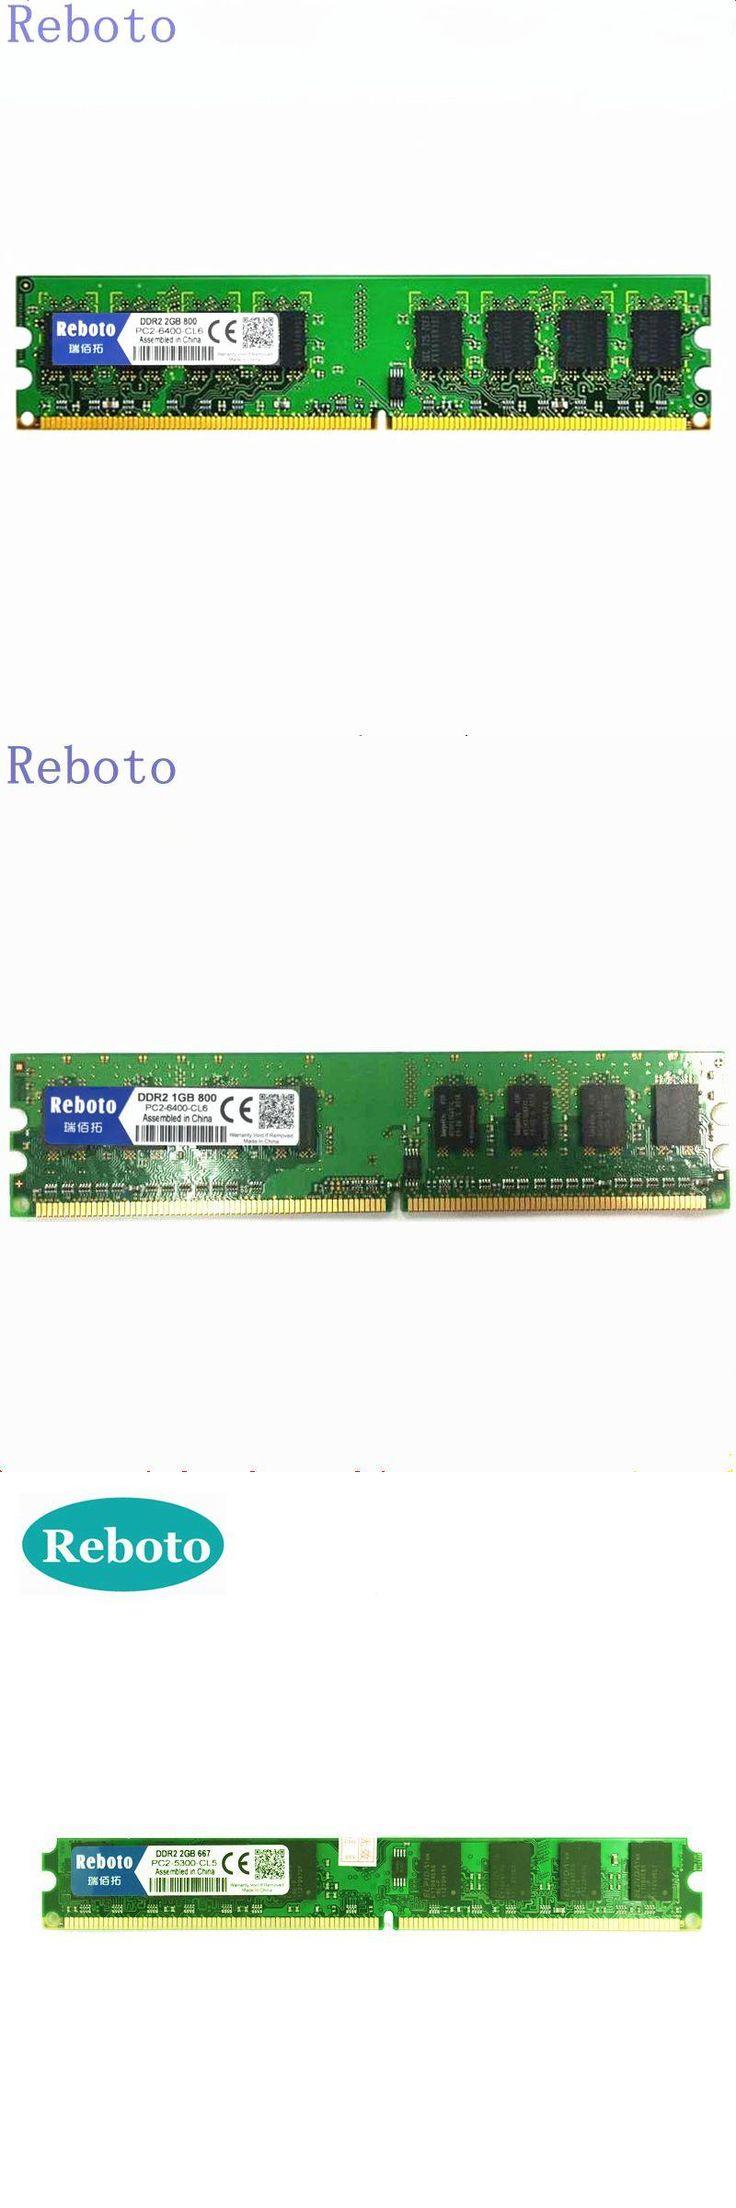 [Visit to Buy] Reboto  DDR2 800Mhz/ 667MhzPC2-6400 5300 1GB/2GB for Desktop RAM Memory 240pin Free Shipping #Advertisement